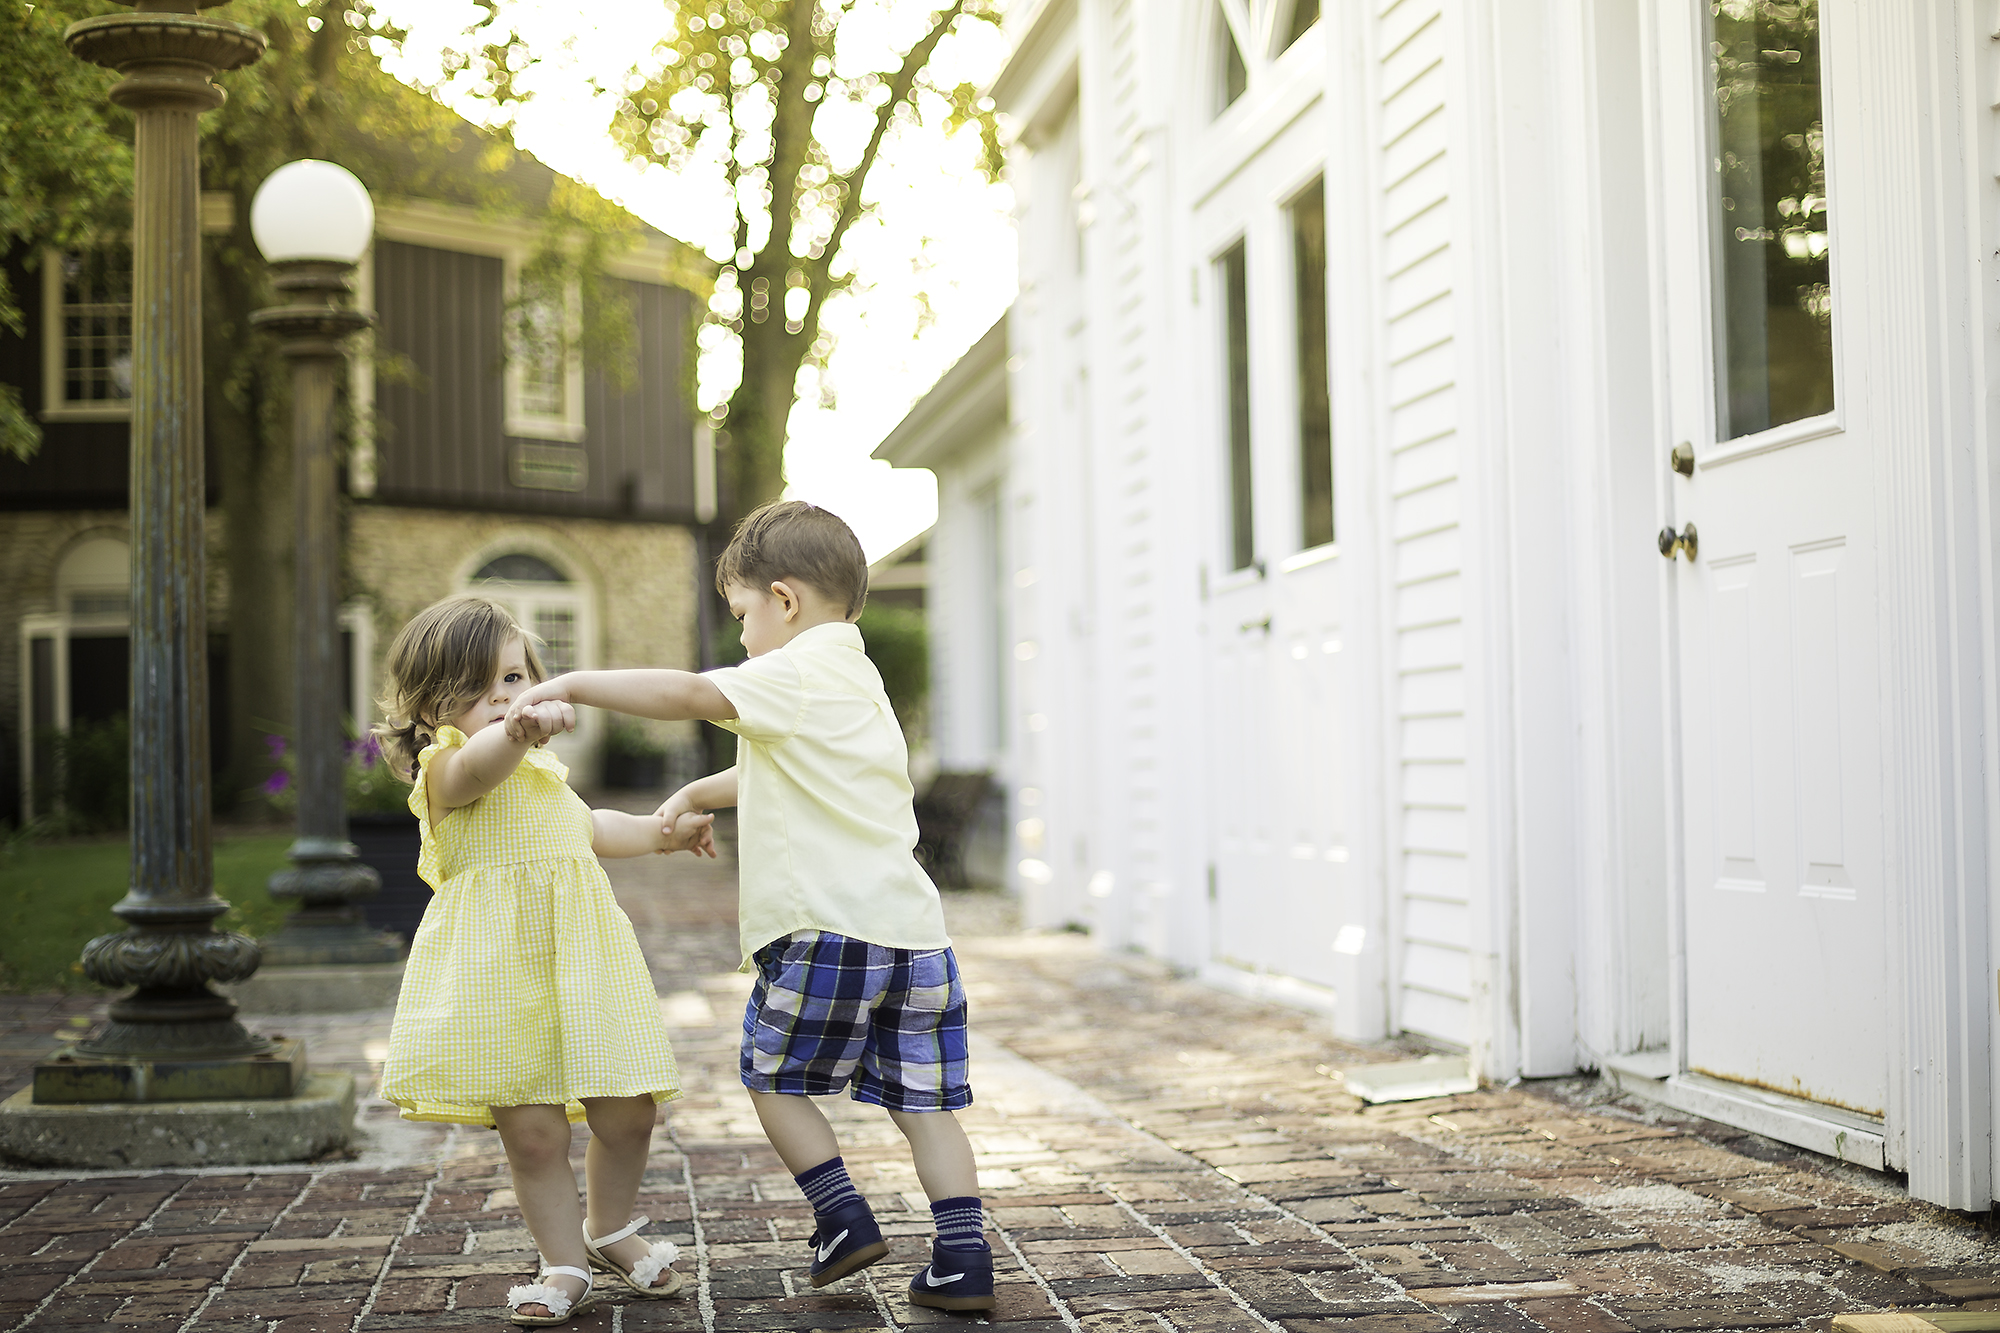 bethany-brinkworth-photography_toddler-cousins-dancing.jpg